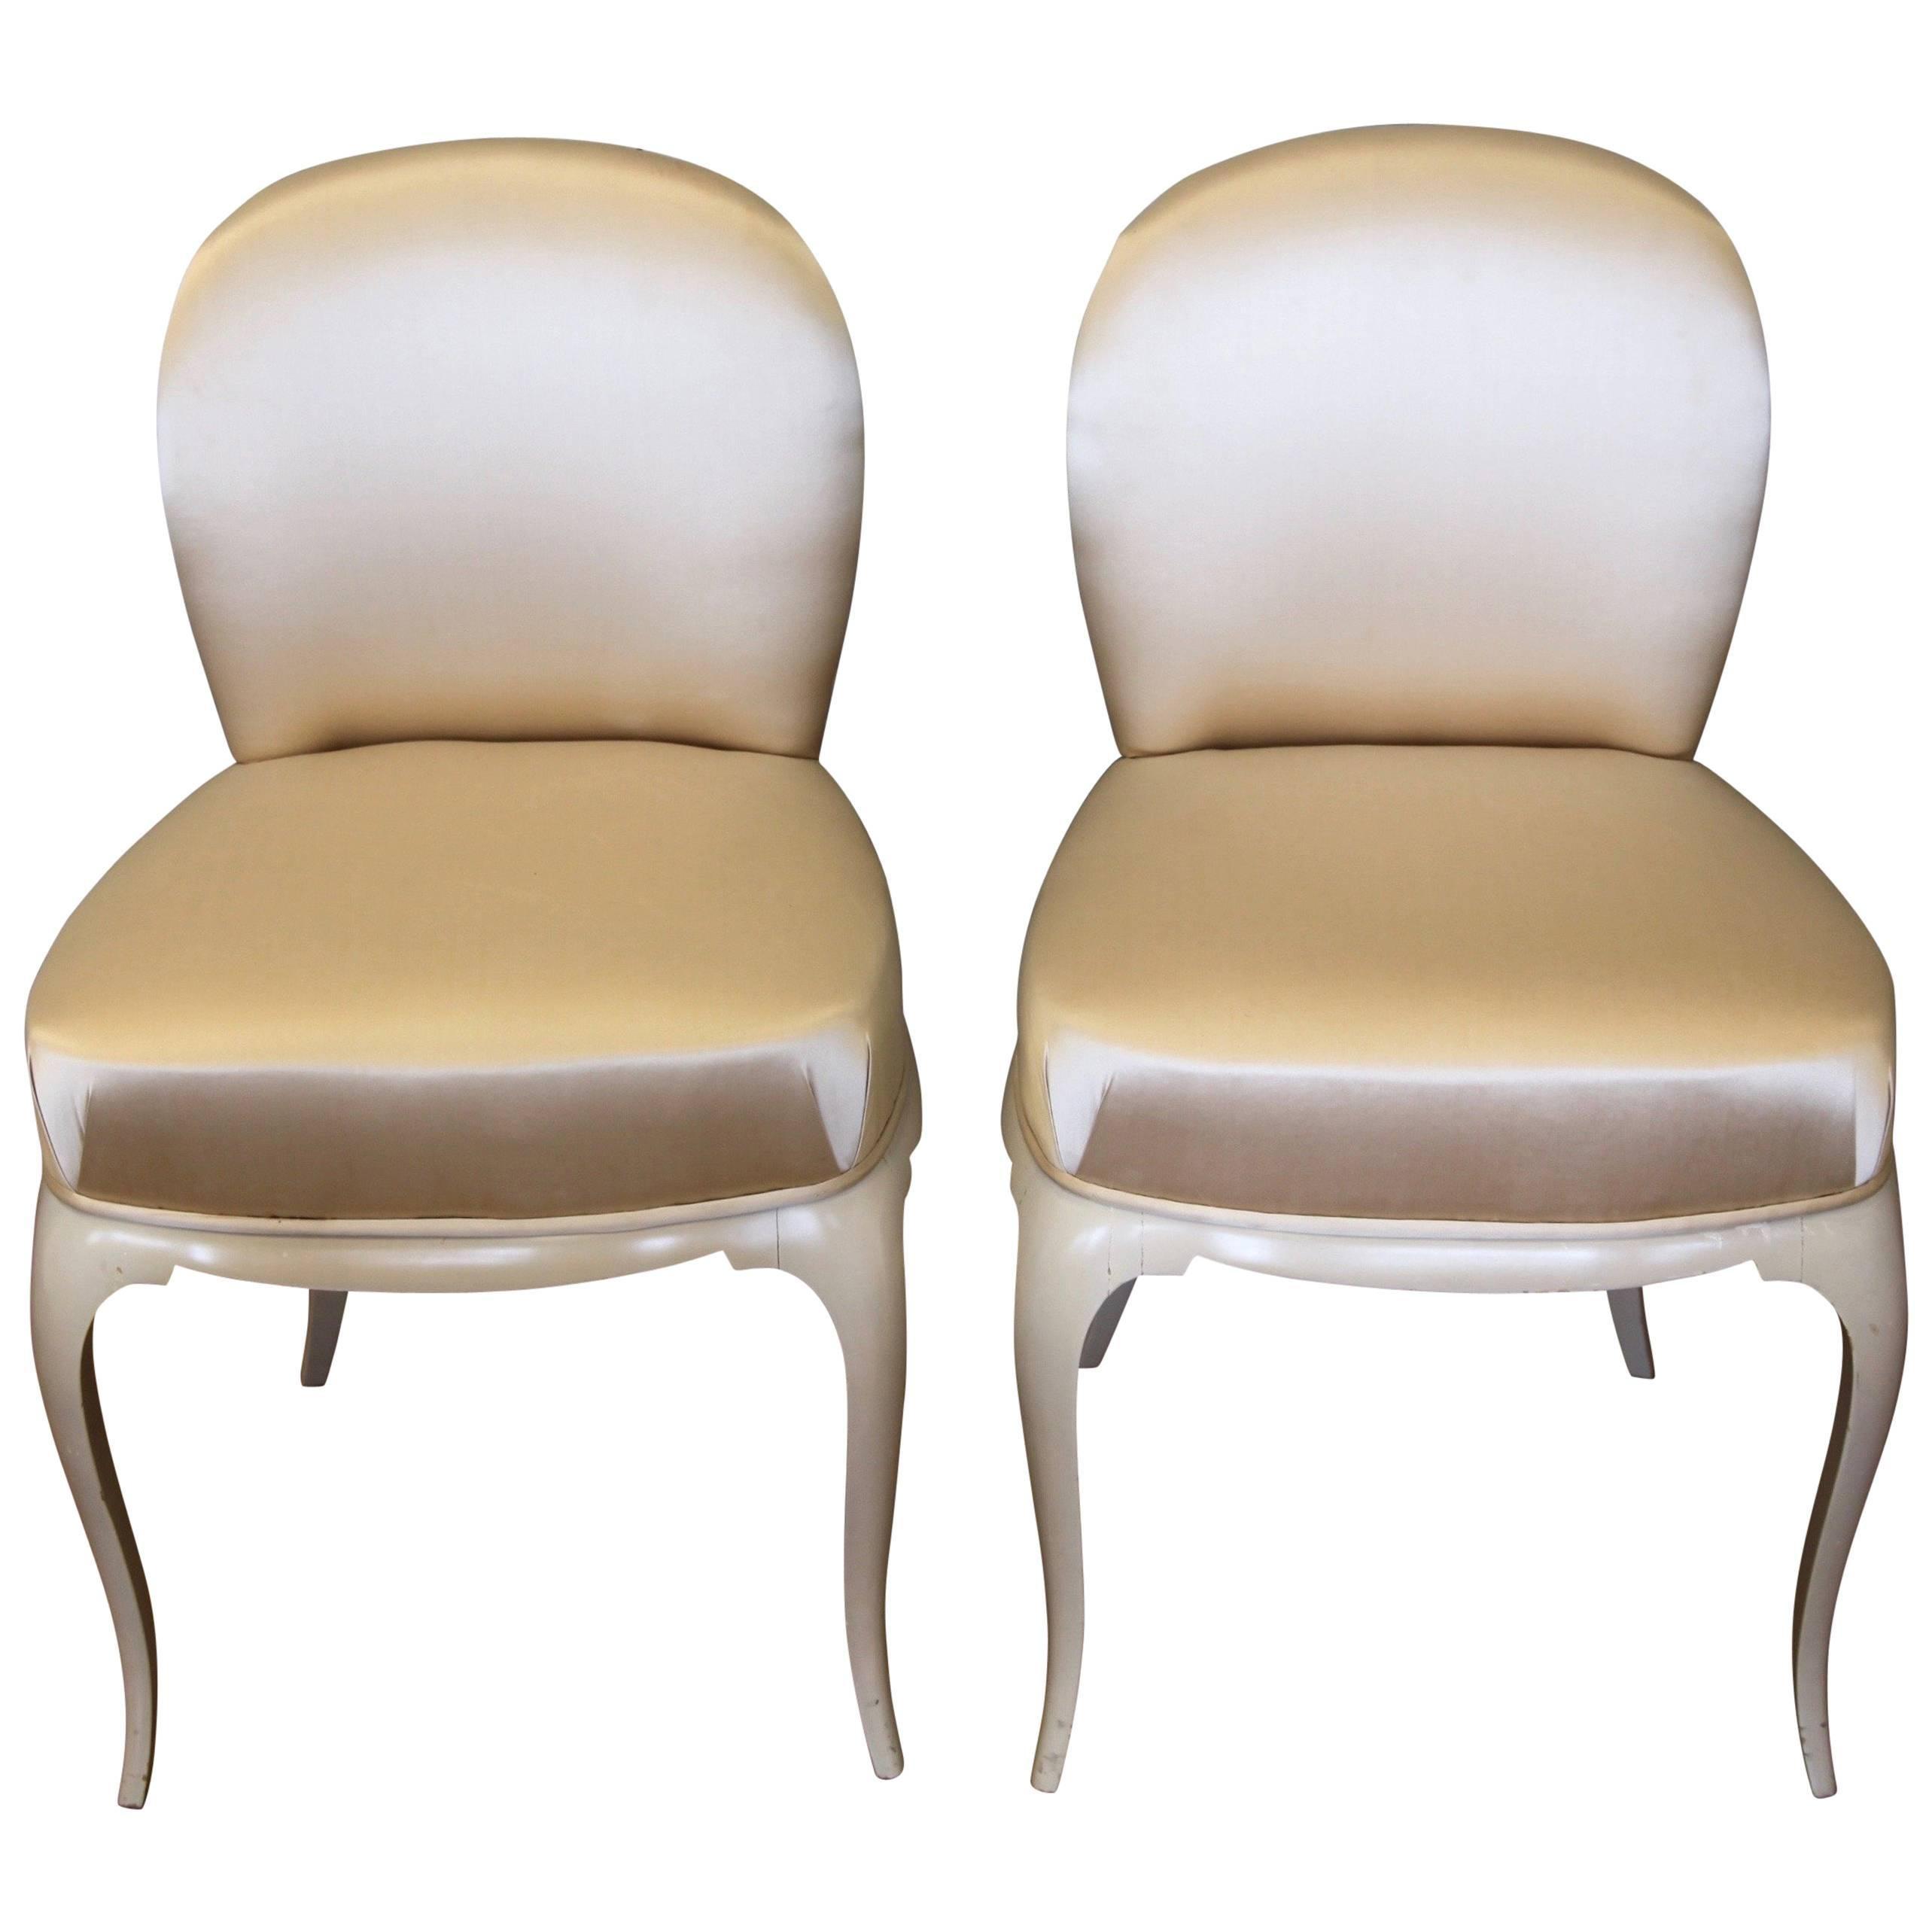 Pair of René Prou Chairs, 1930s, Art Deco